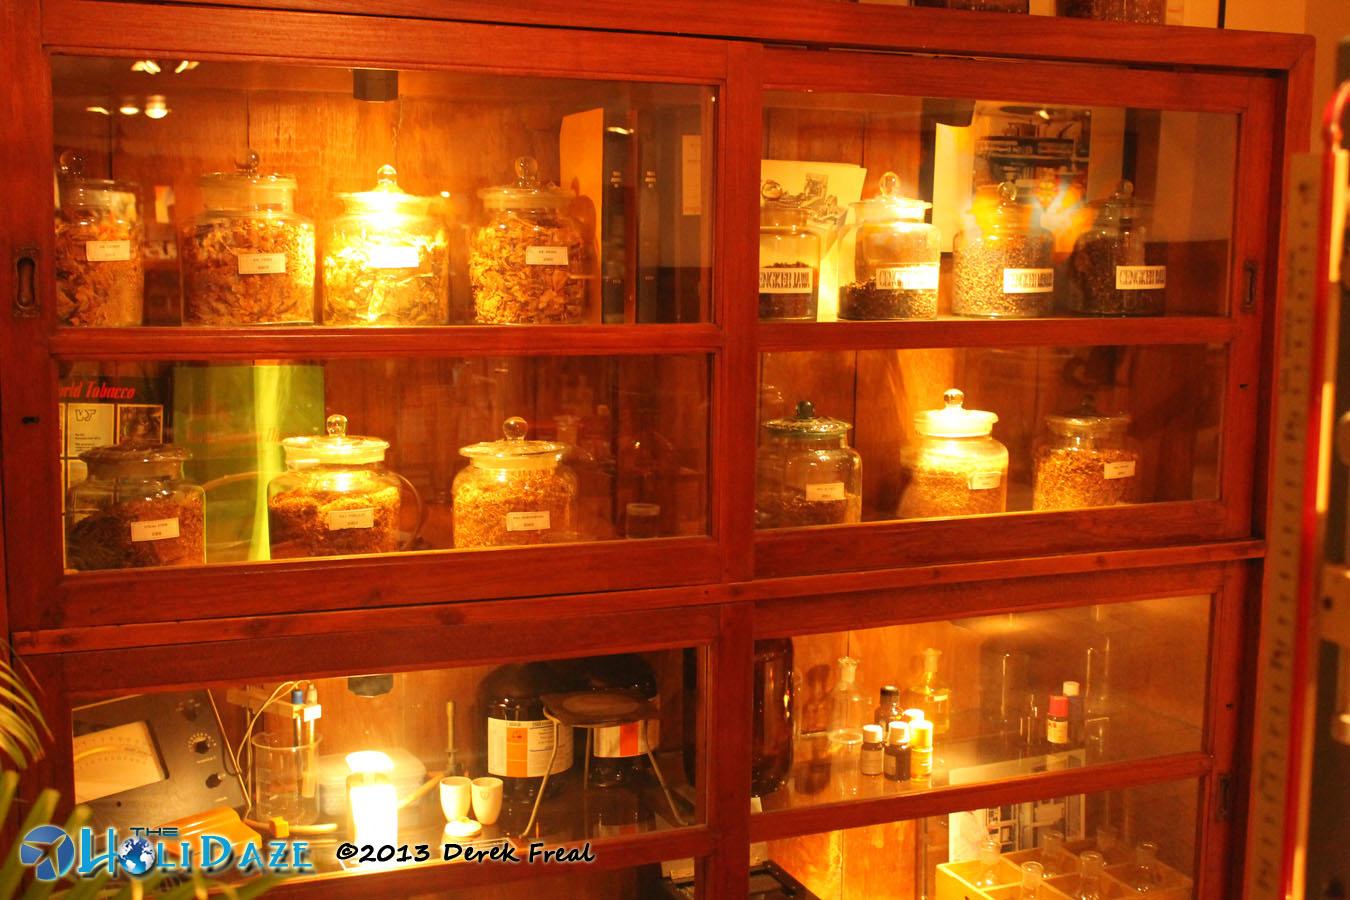 Classic Cigarette Laboratory Equipment At House Of Sampoerna